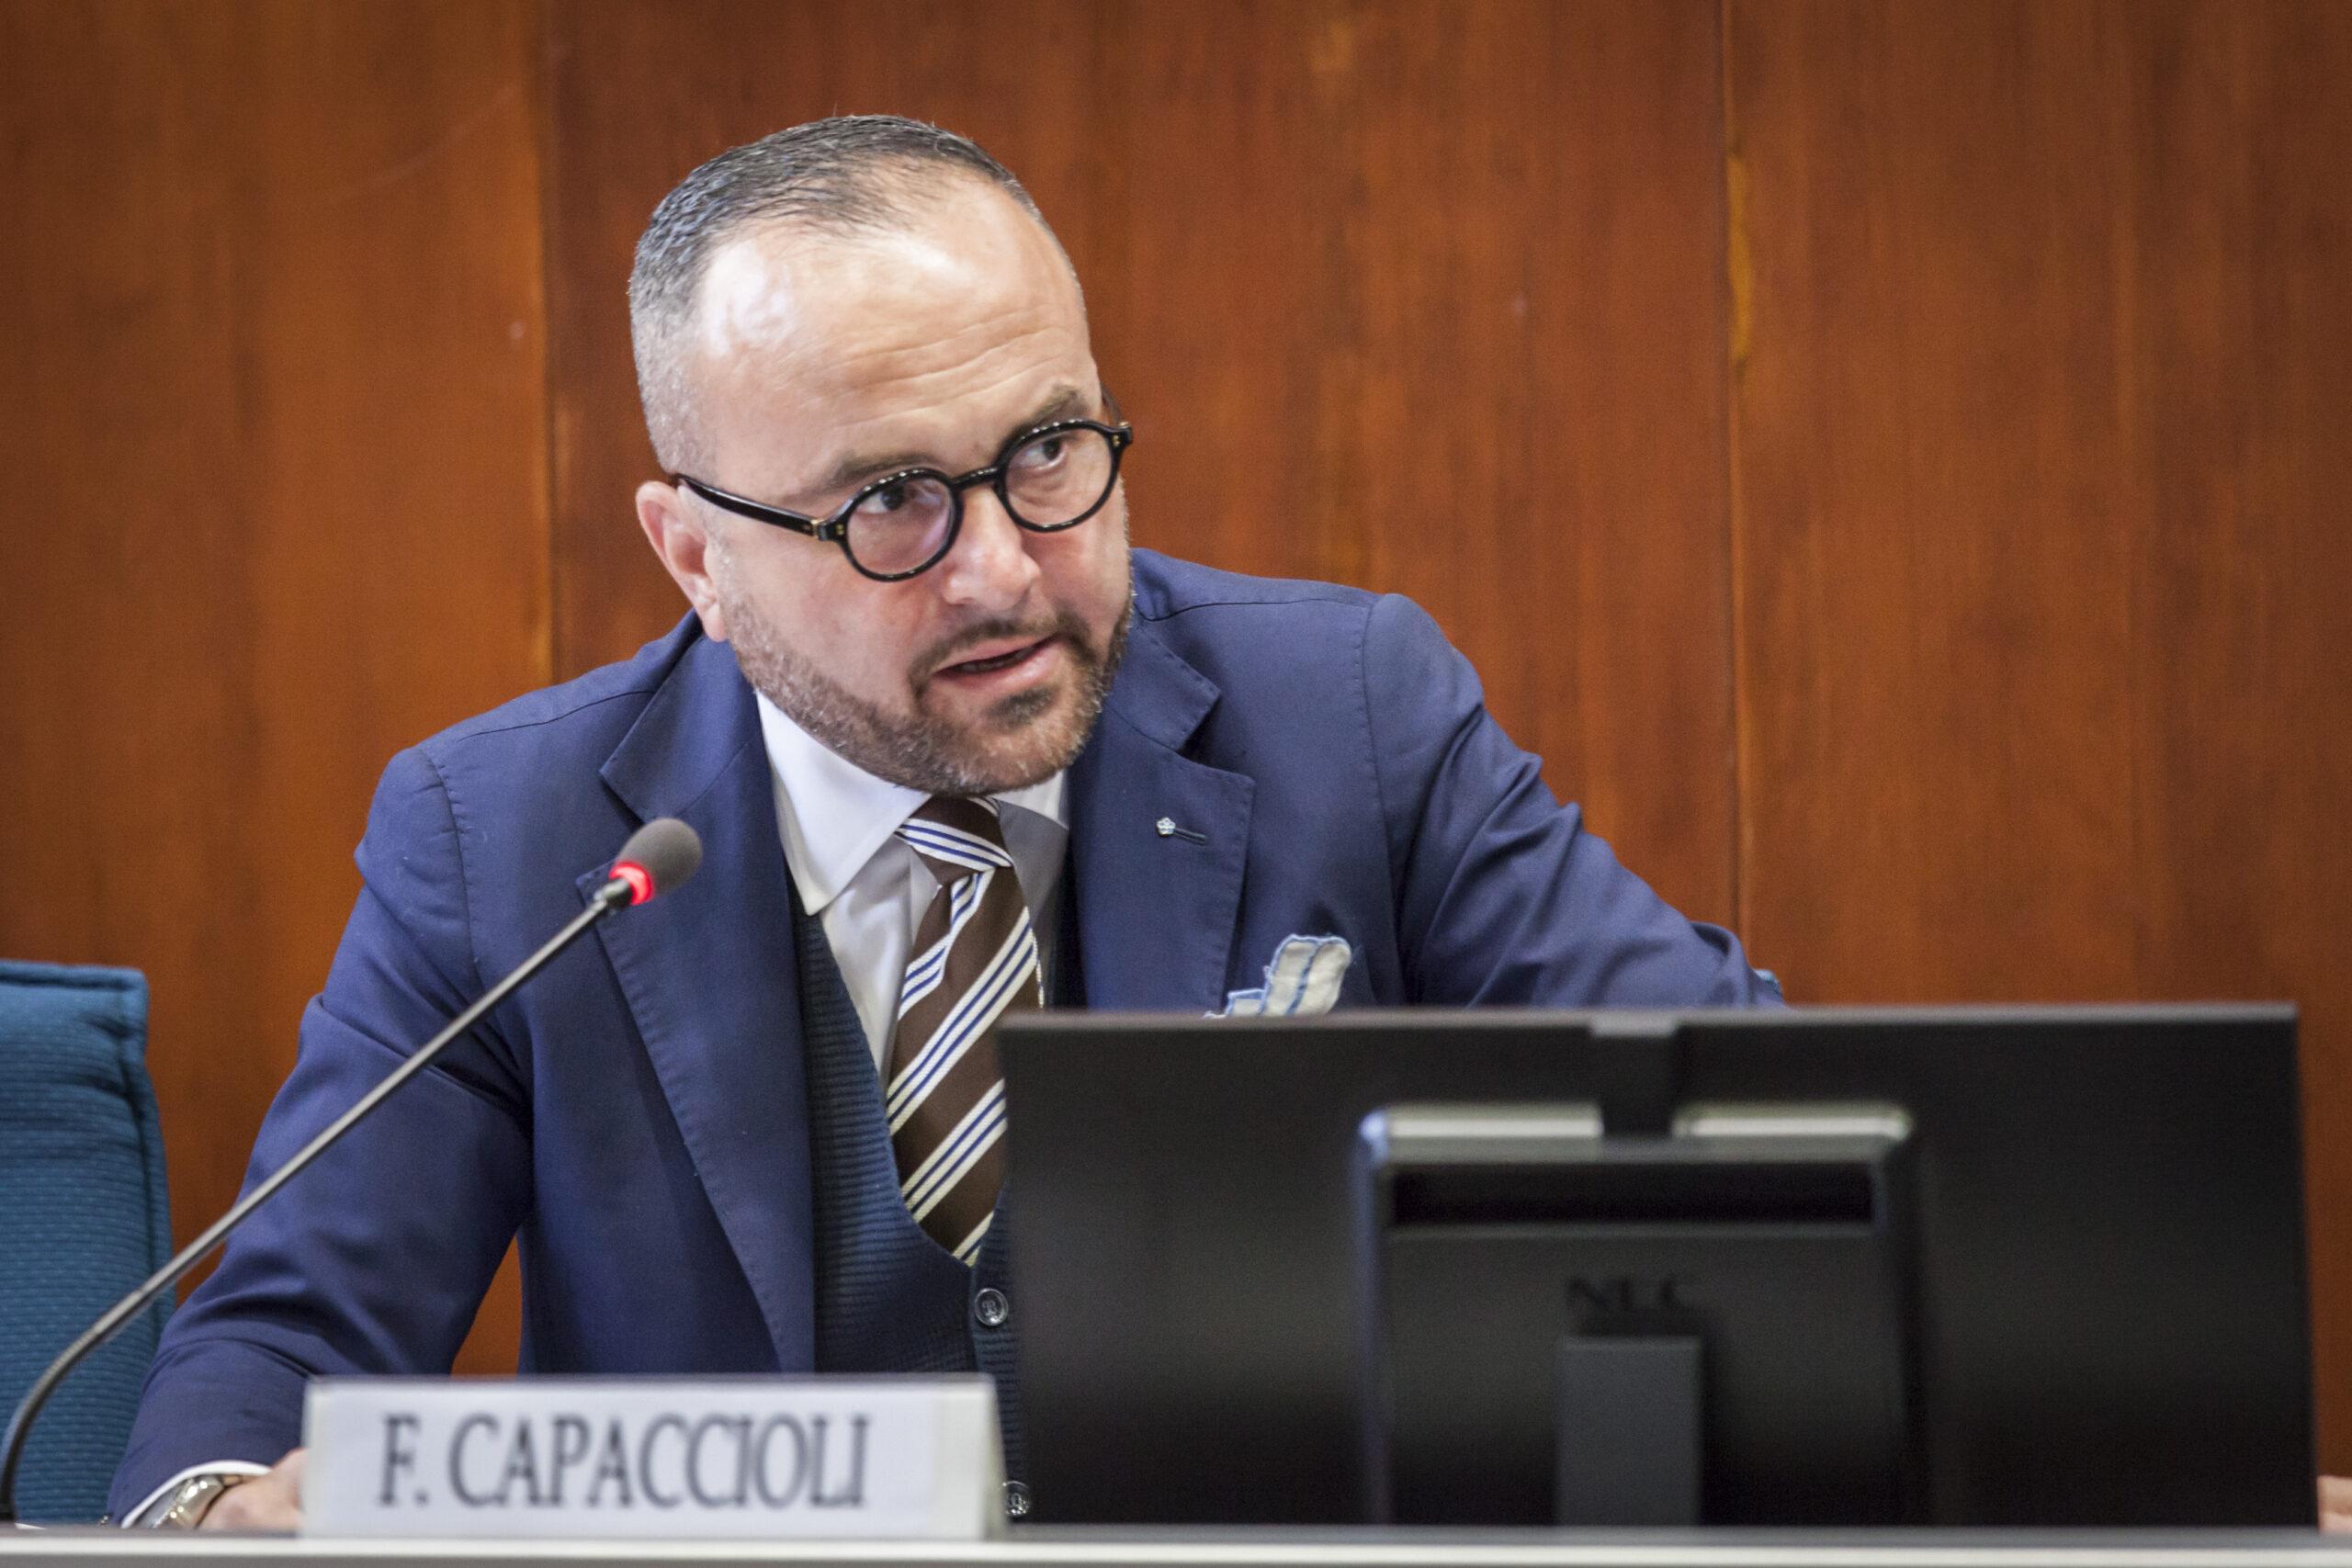 Fabrizio Capaccioli Asacert